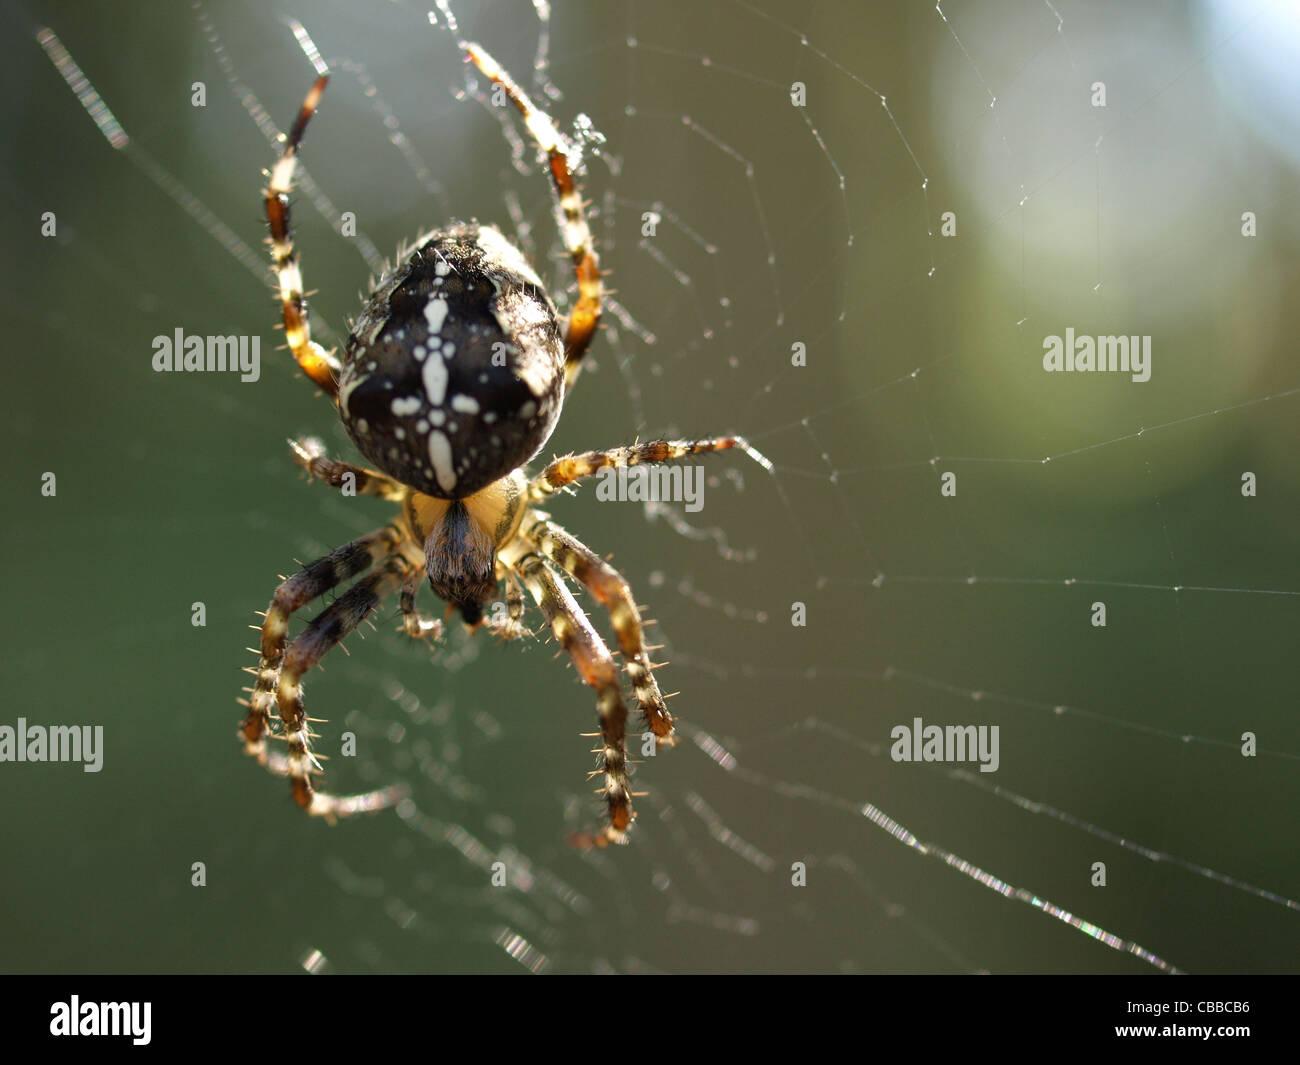 European garden spider / Araneus diadematus / Gartenkreuzspinne - Stock Image